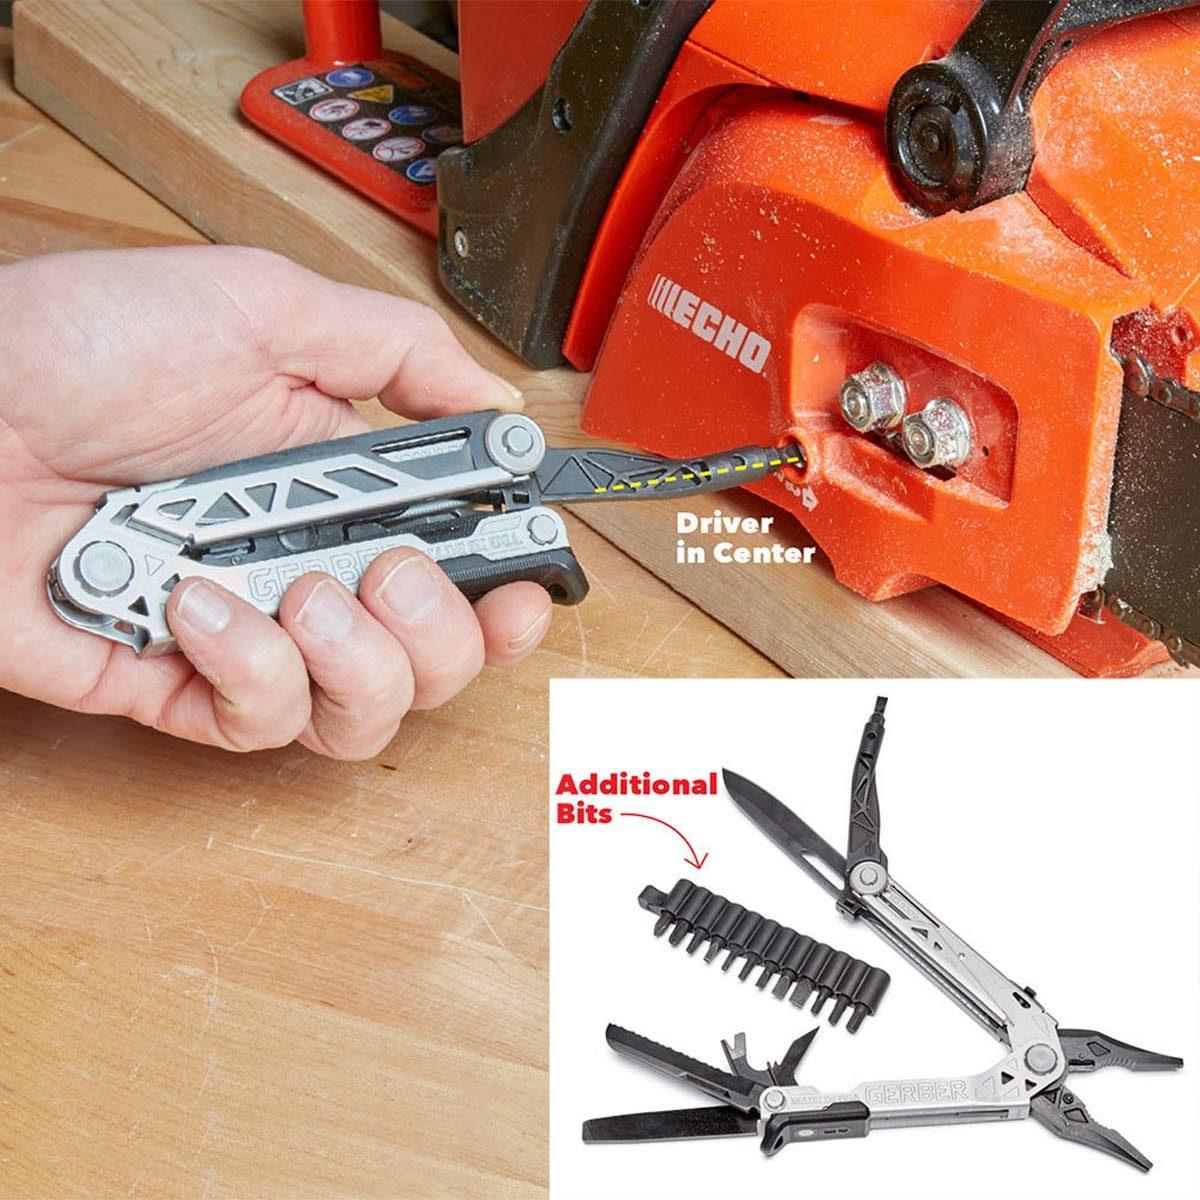 An Innovative Multi-tool